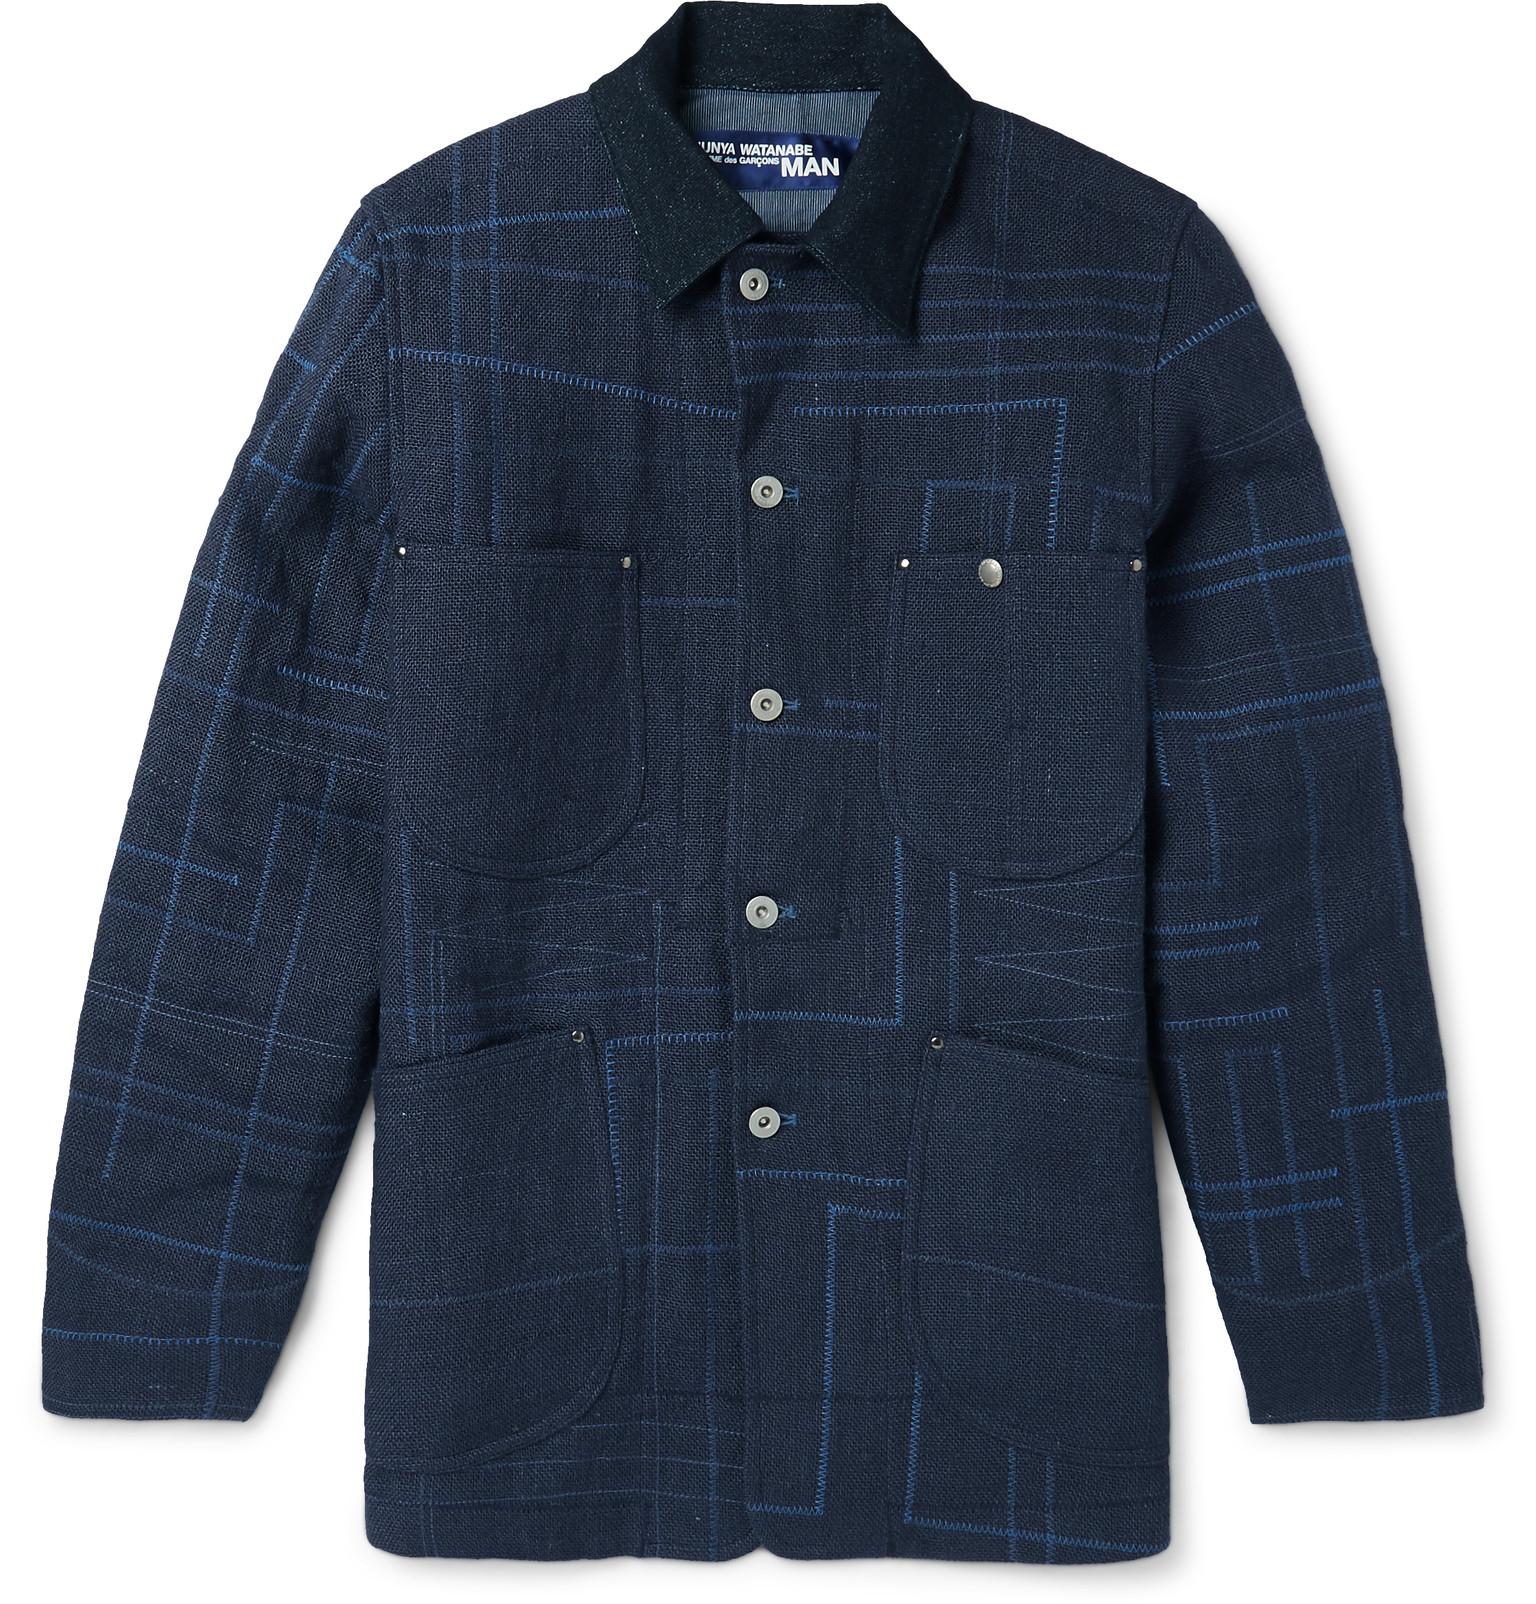 Junya Watanabe Elbow Patch Jute-canvas Jacket In Blue For Men | Lyst